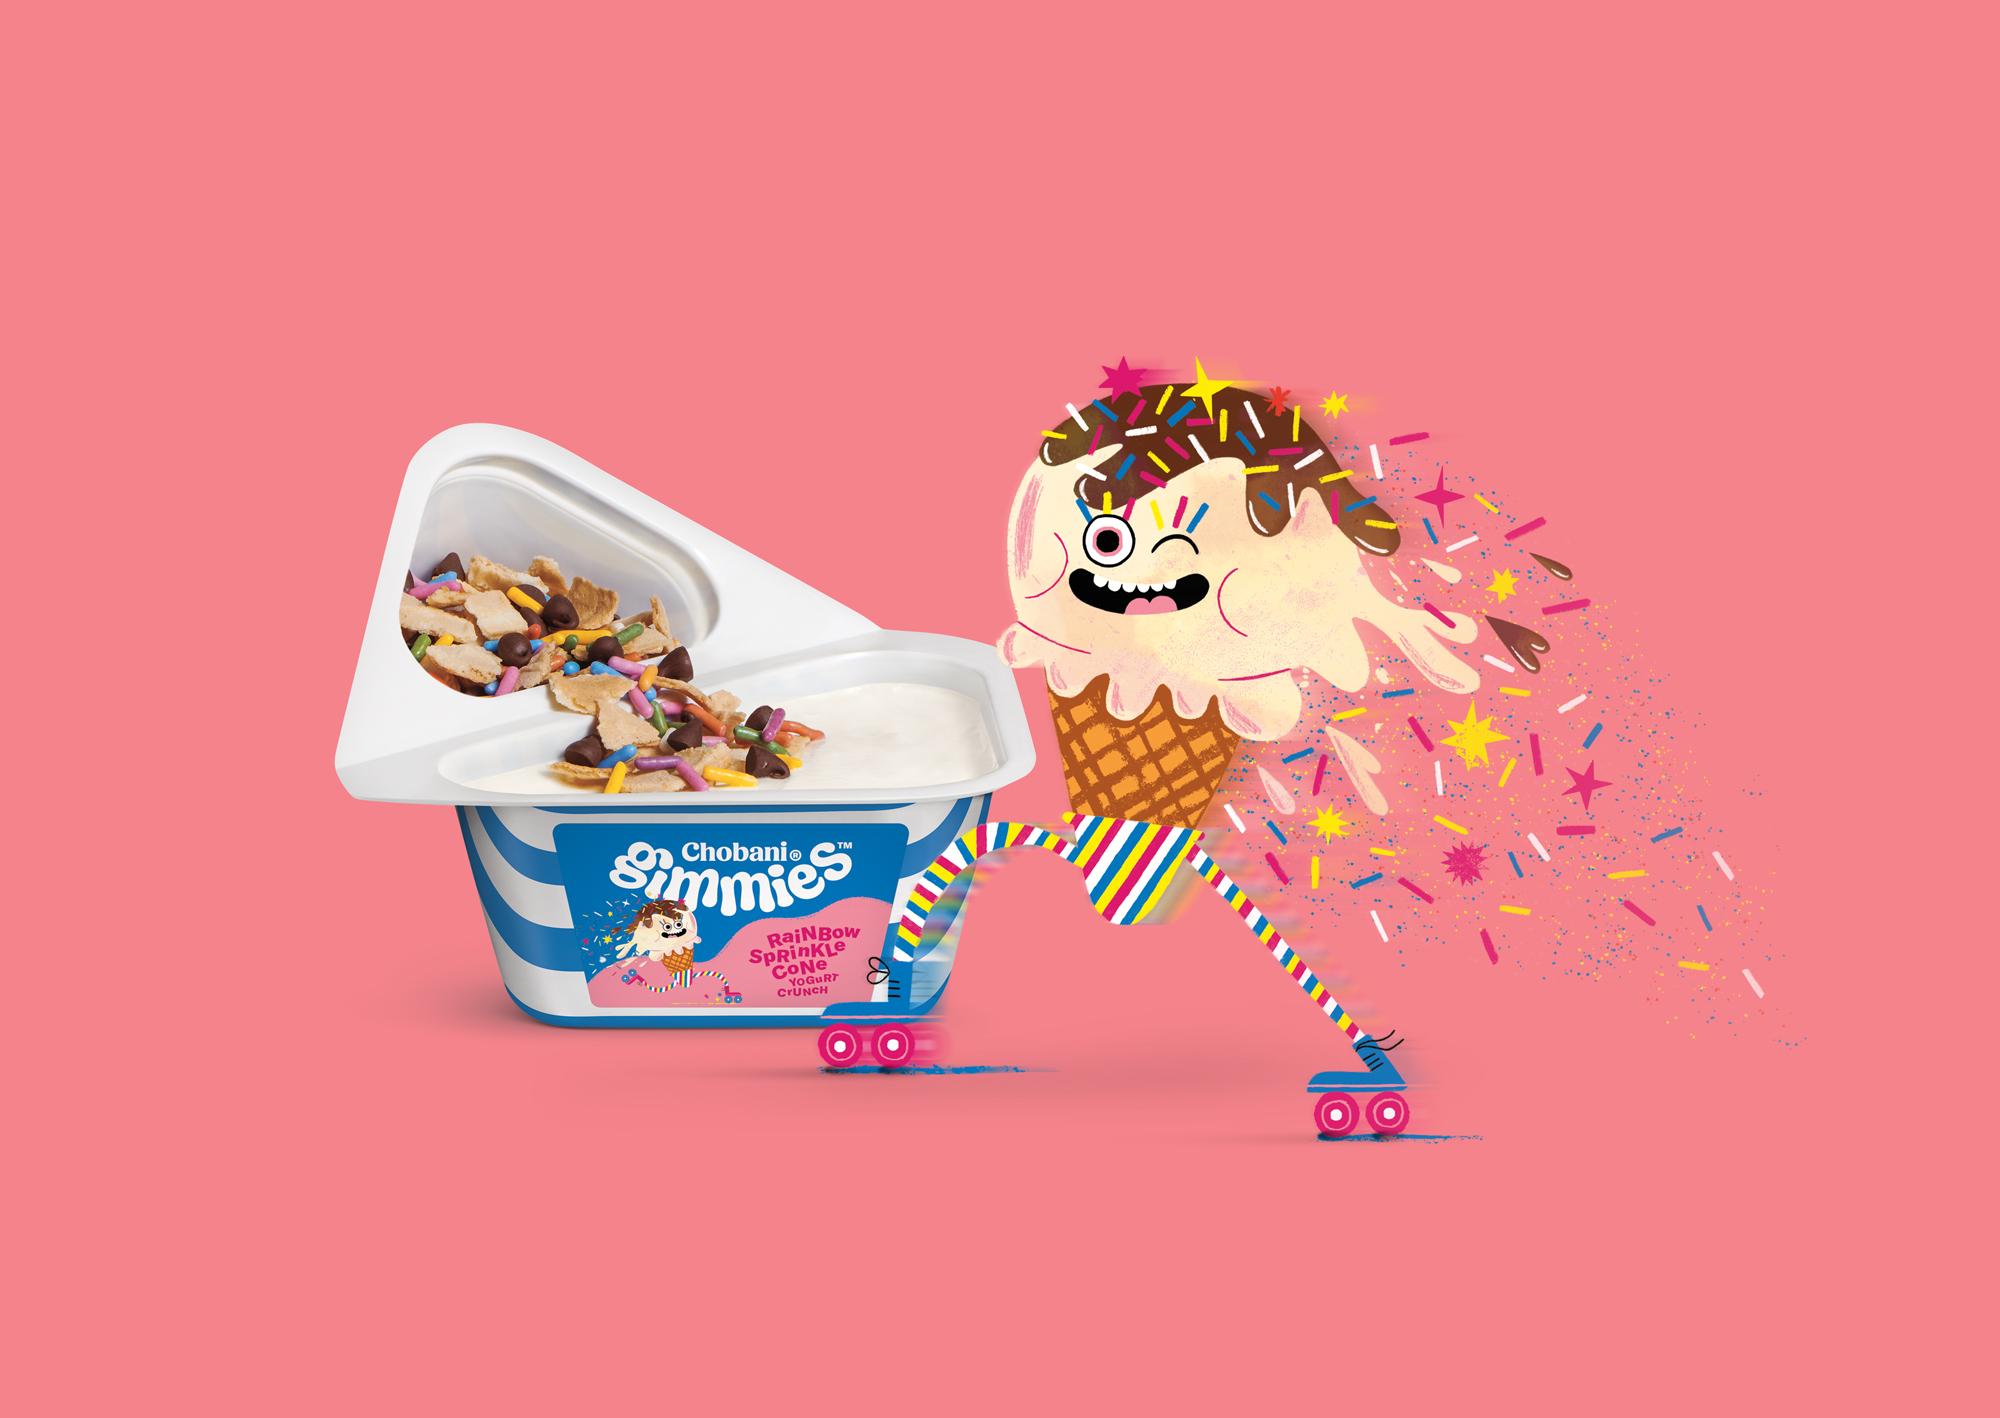 patiadanzadotcom_ChobaniGimmies_SprinkleConeHero.jpg